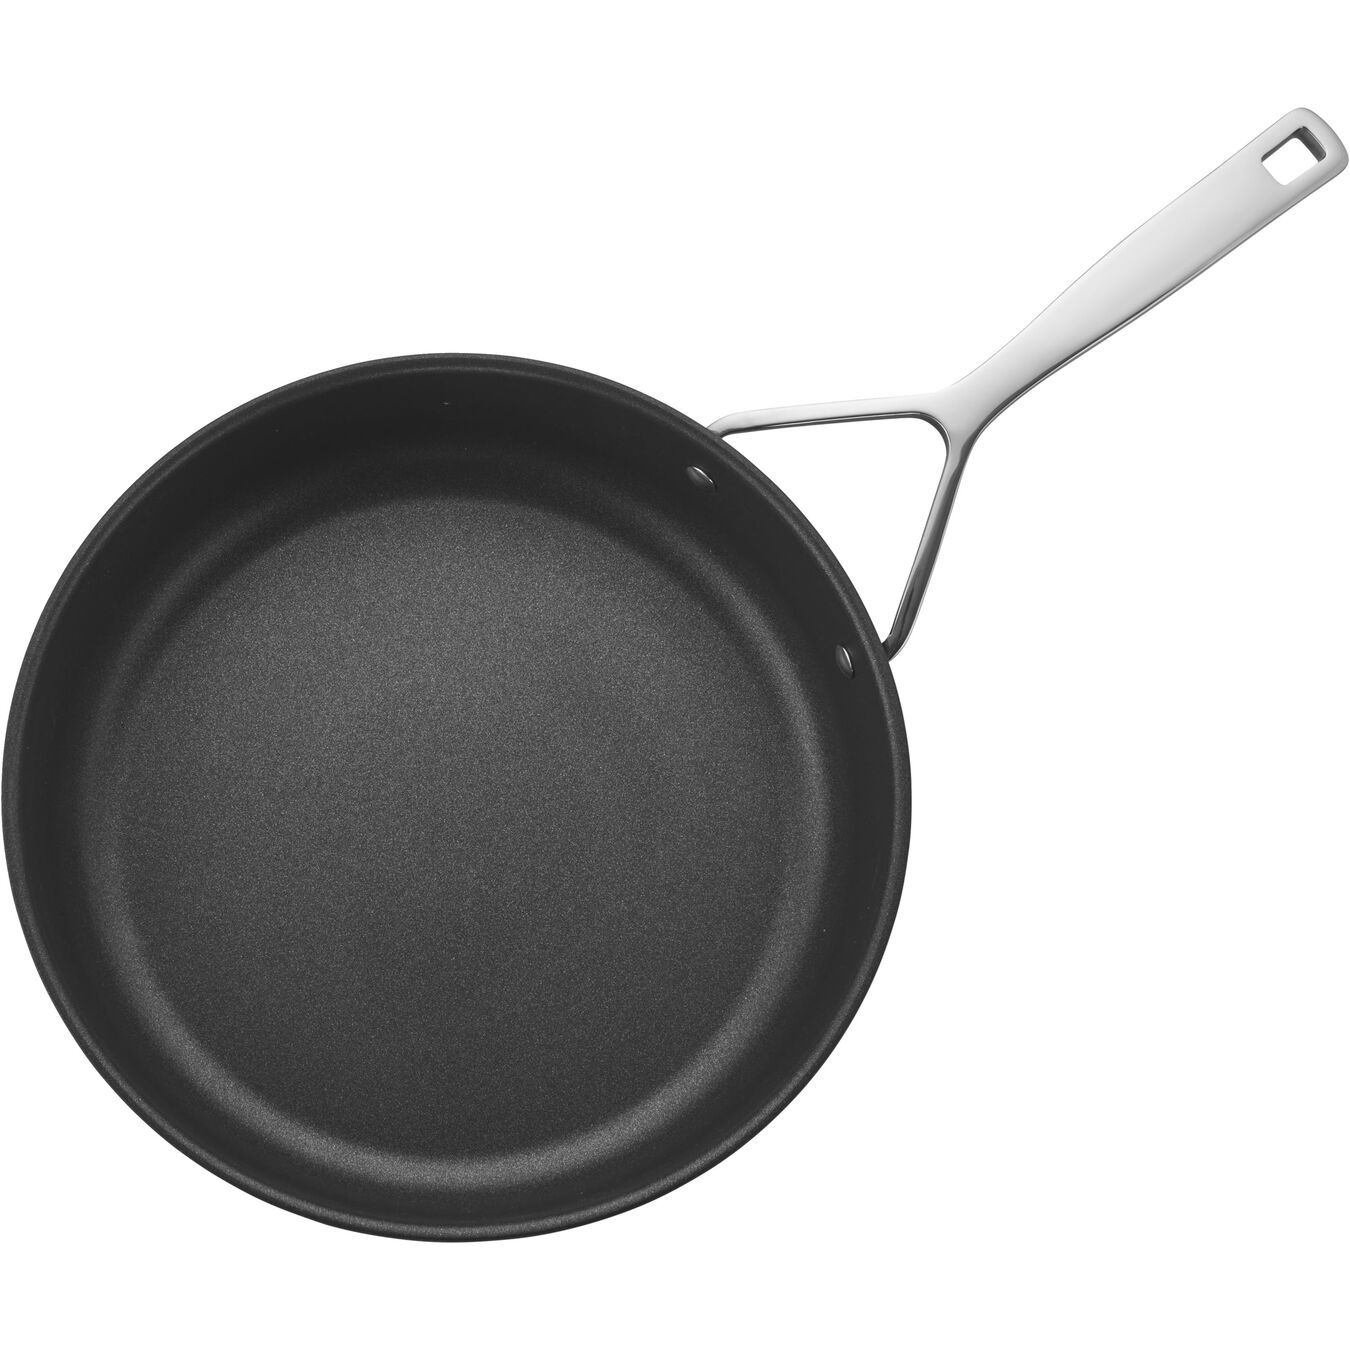 11-inch Aluminum Nonstick Deep Fry Pan,,large 3